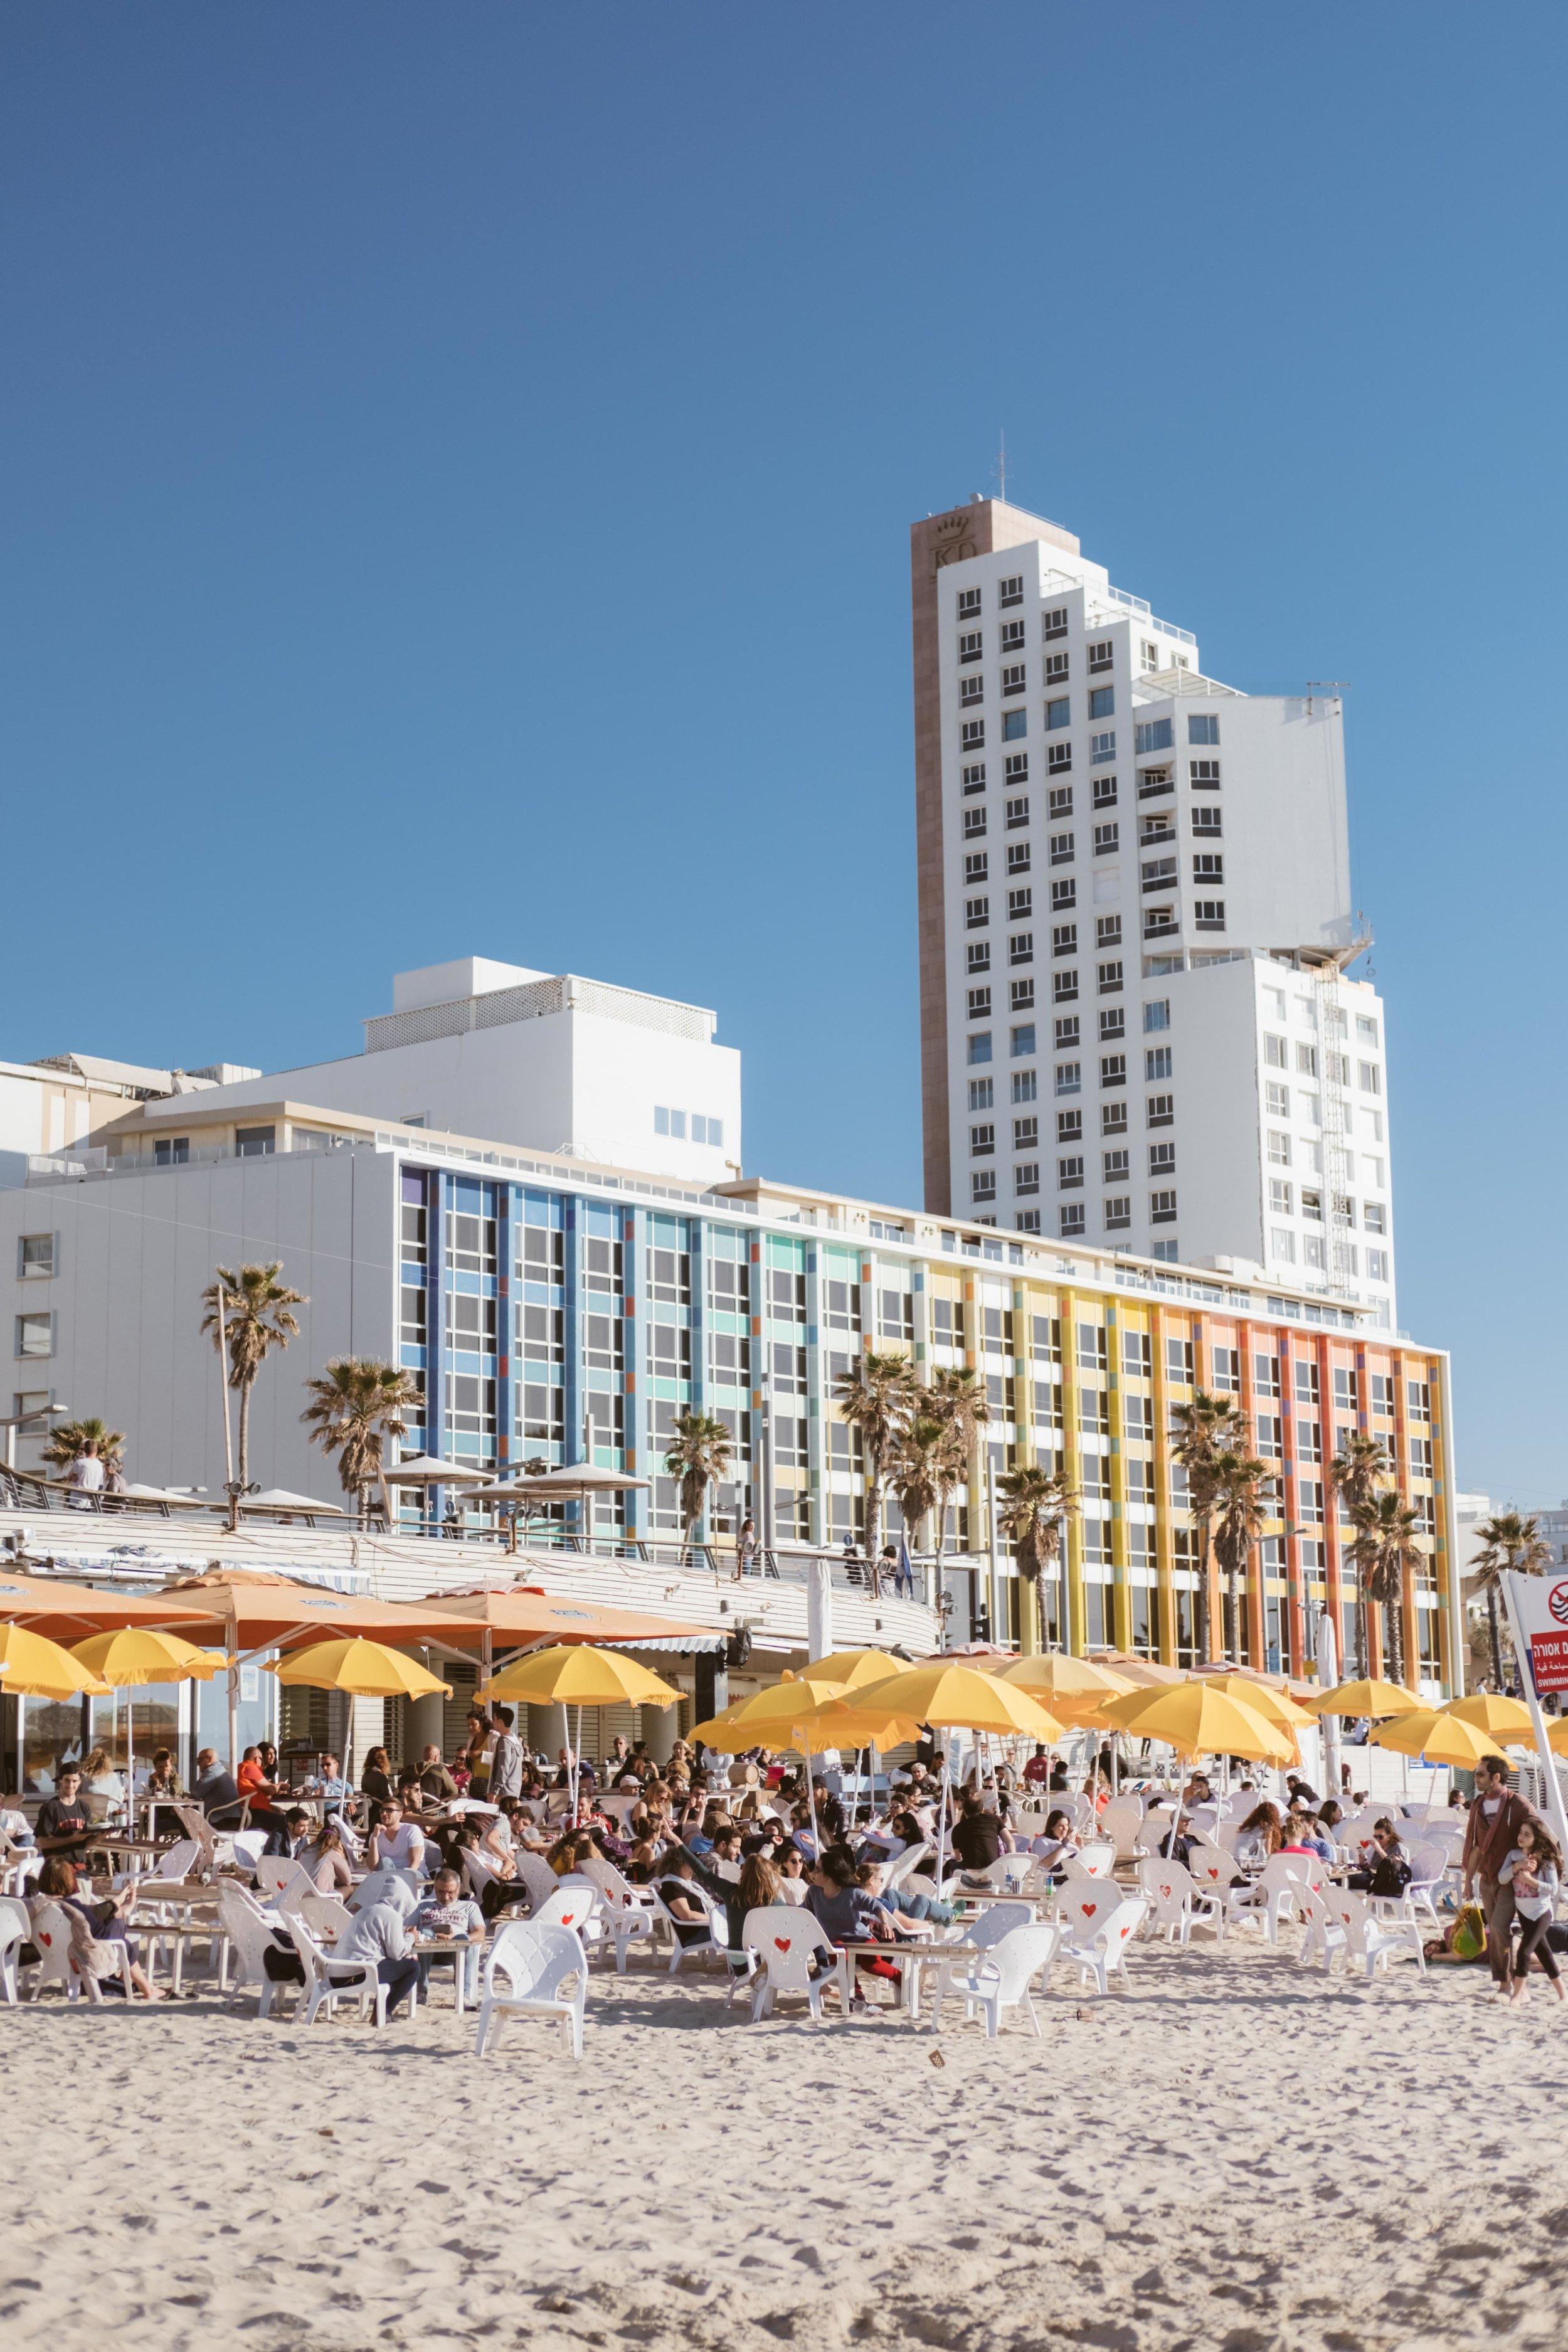 Tel Aviv - Via Tolila